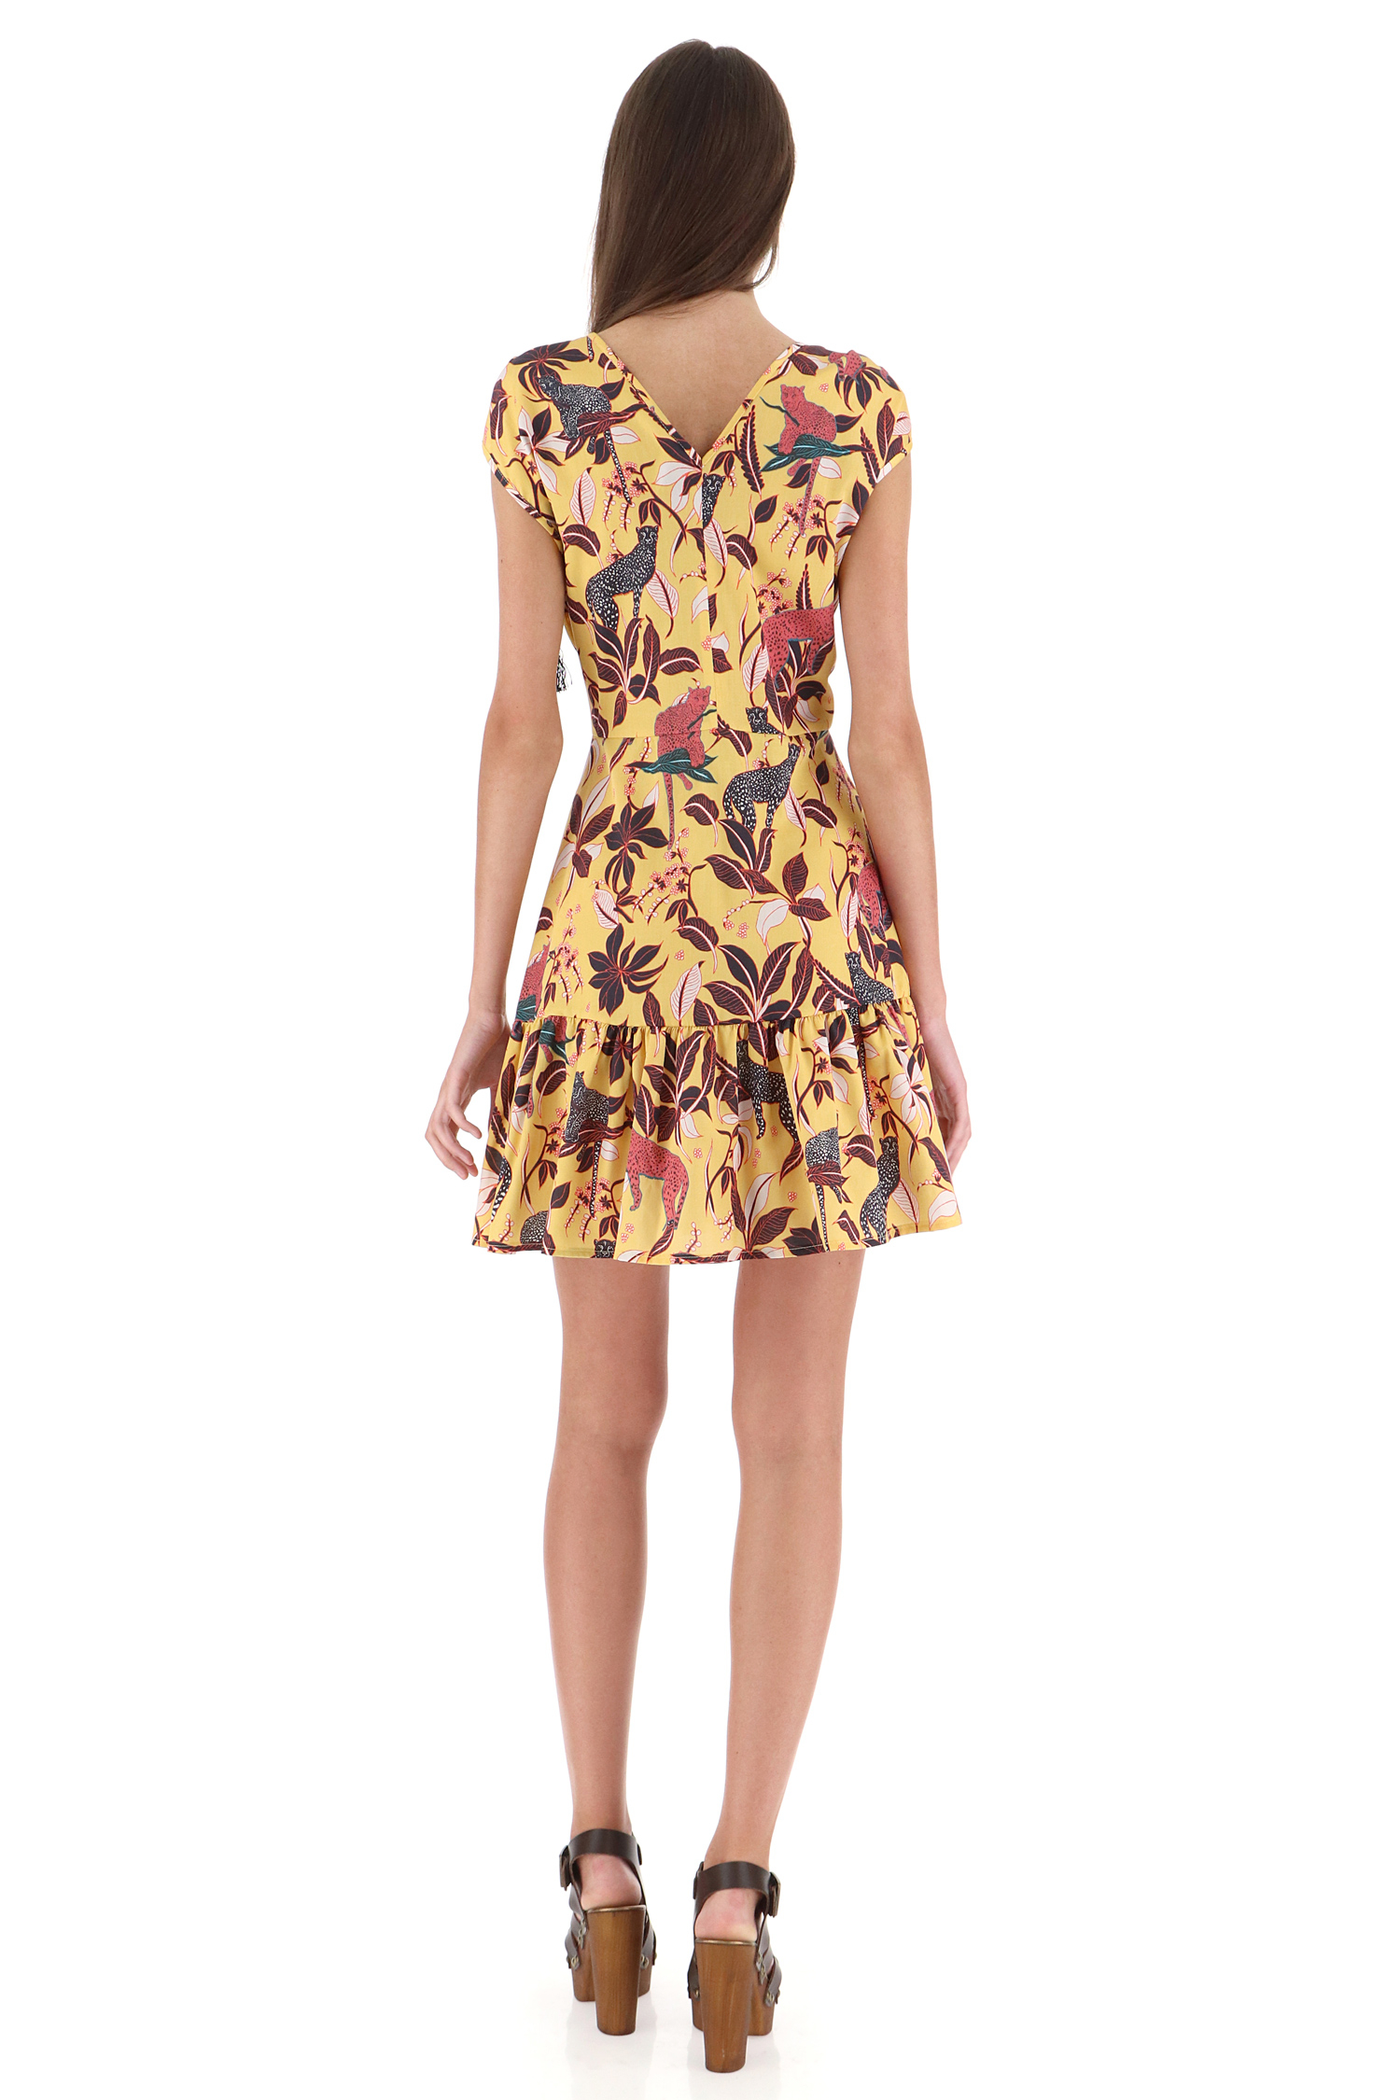 Жовта сукня, з прінтом сафарі Imperial